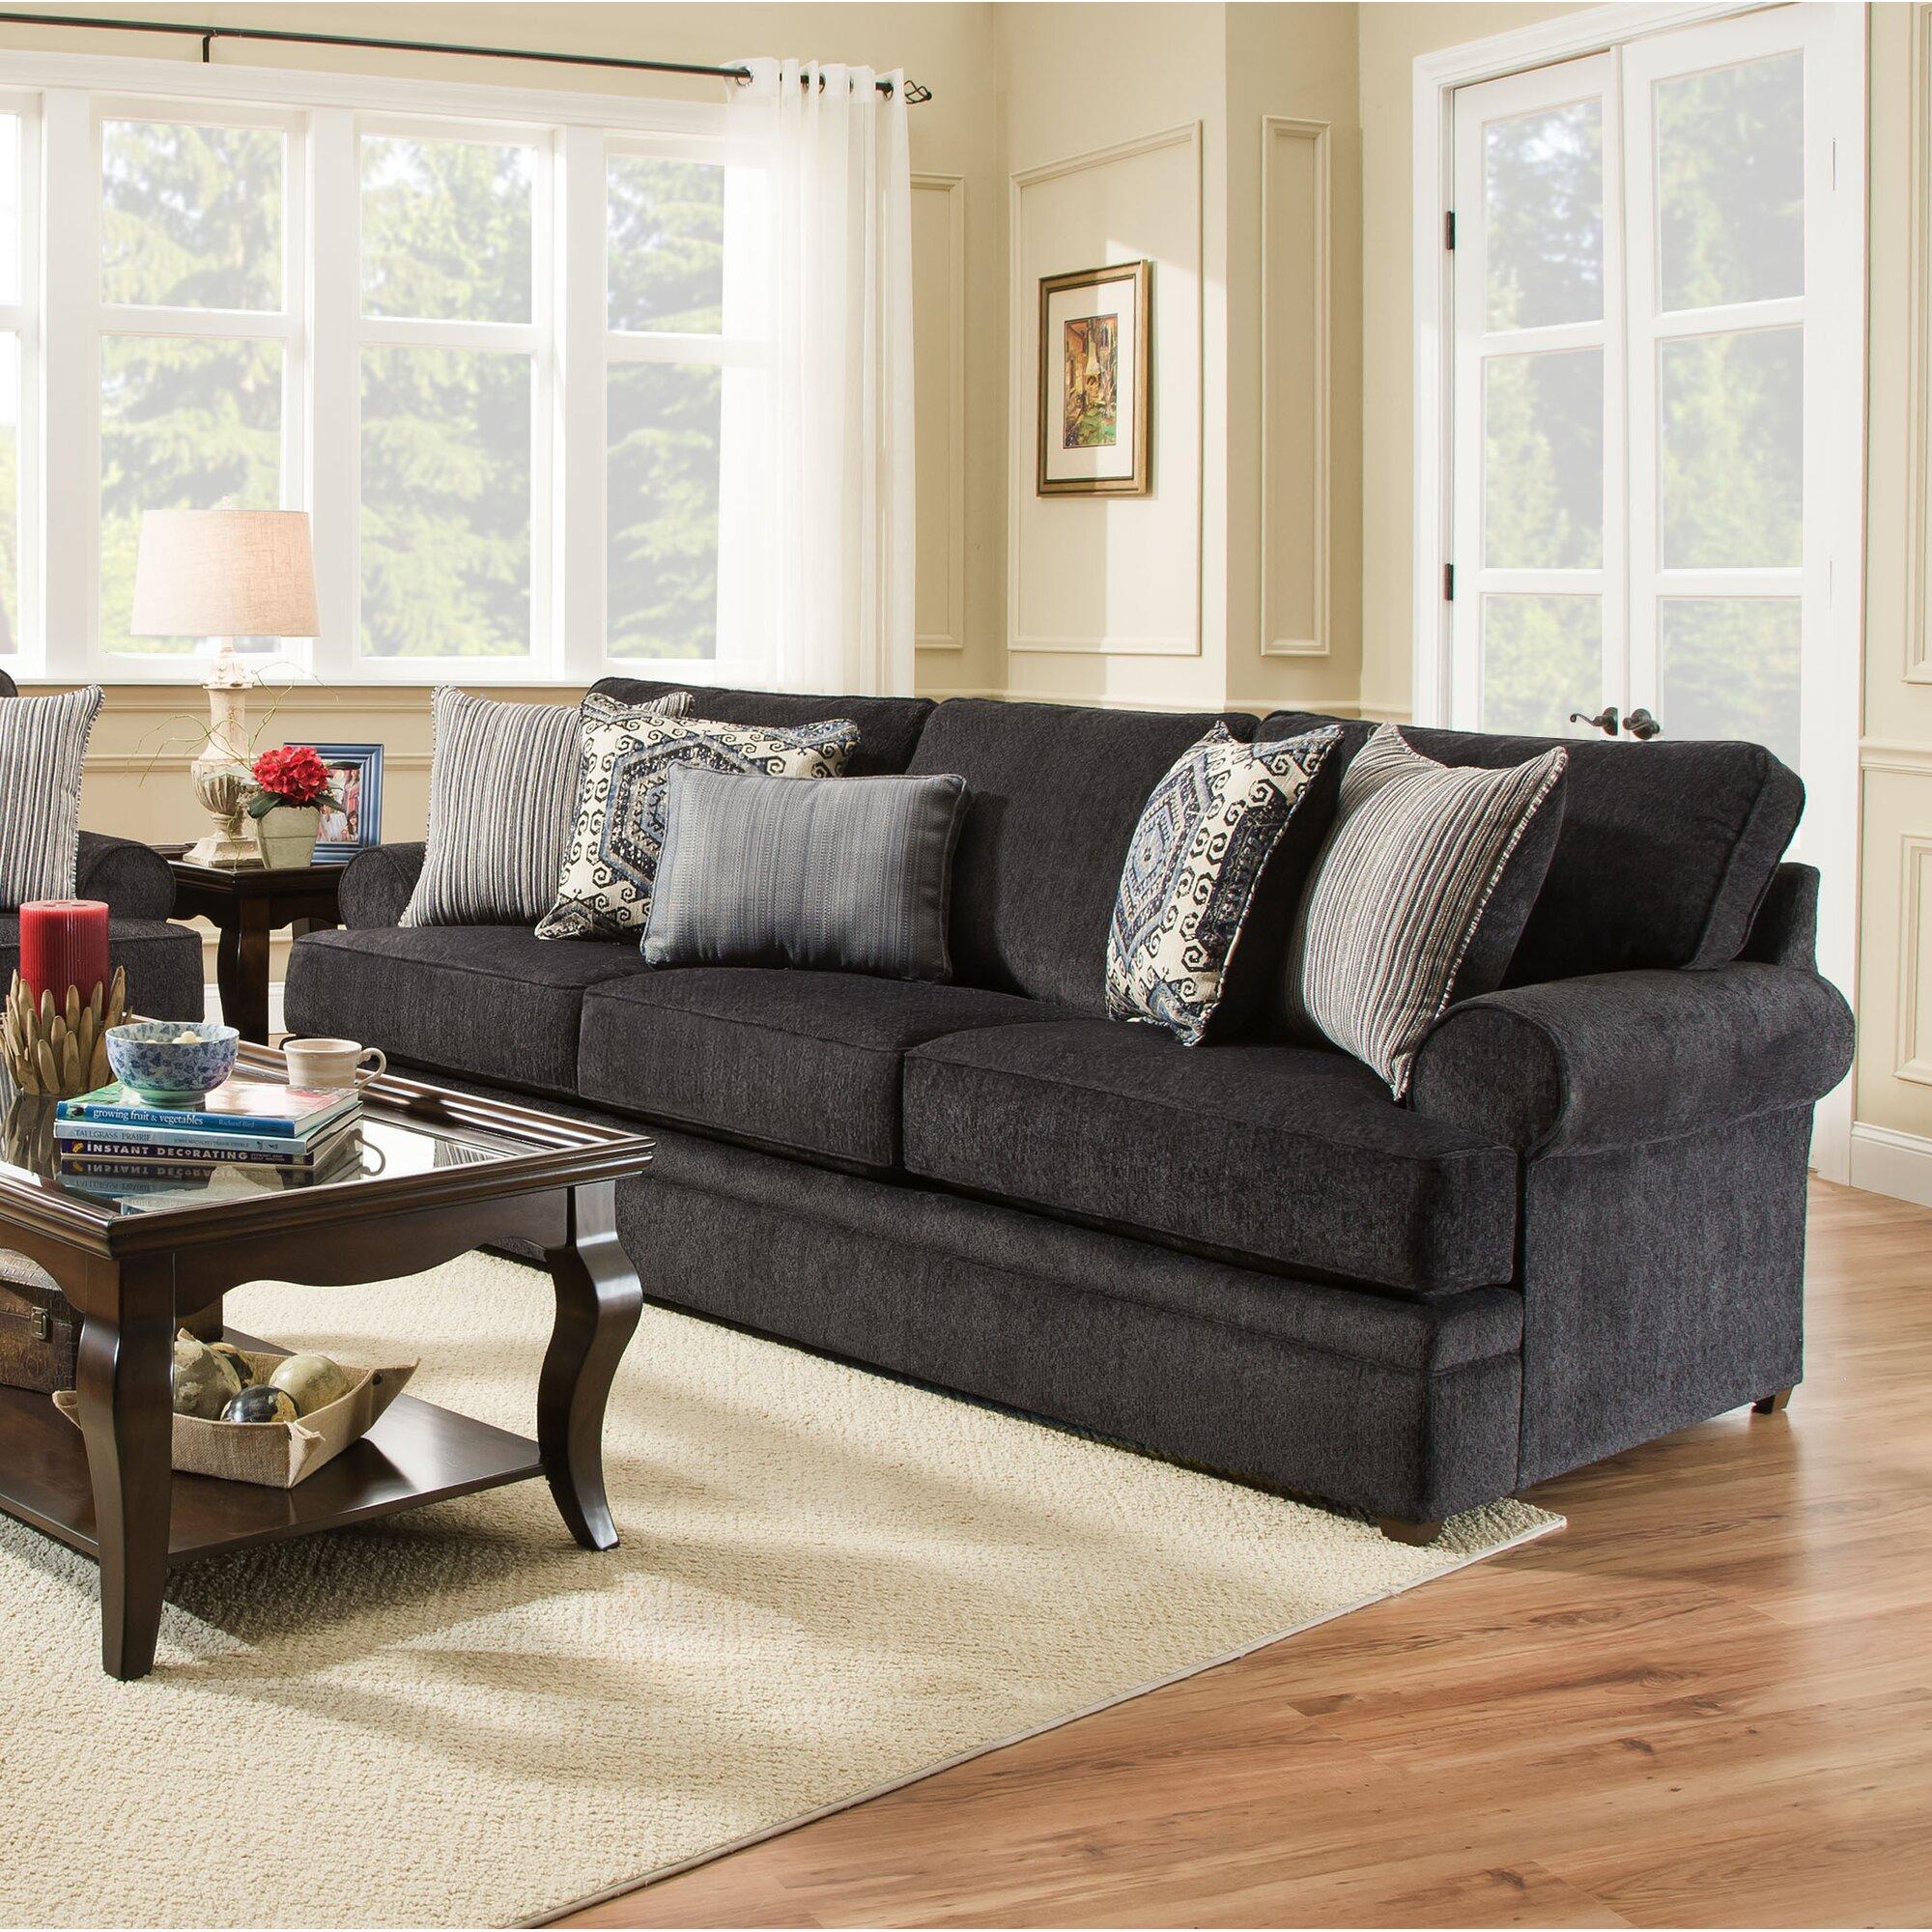 hartley chenille sofa Sofa Hpricot